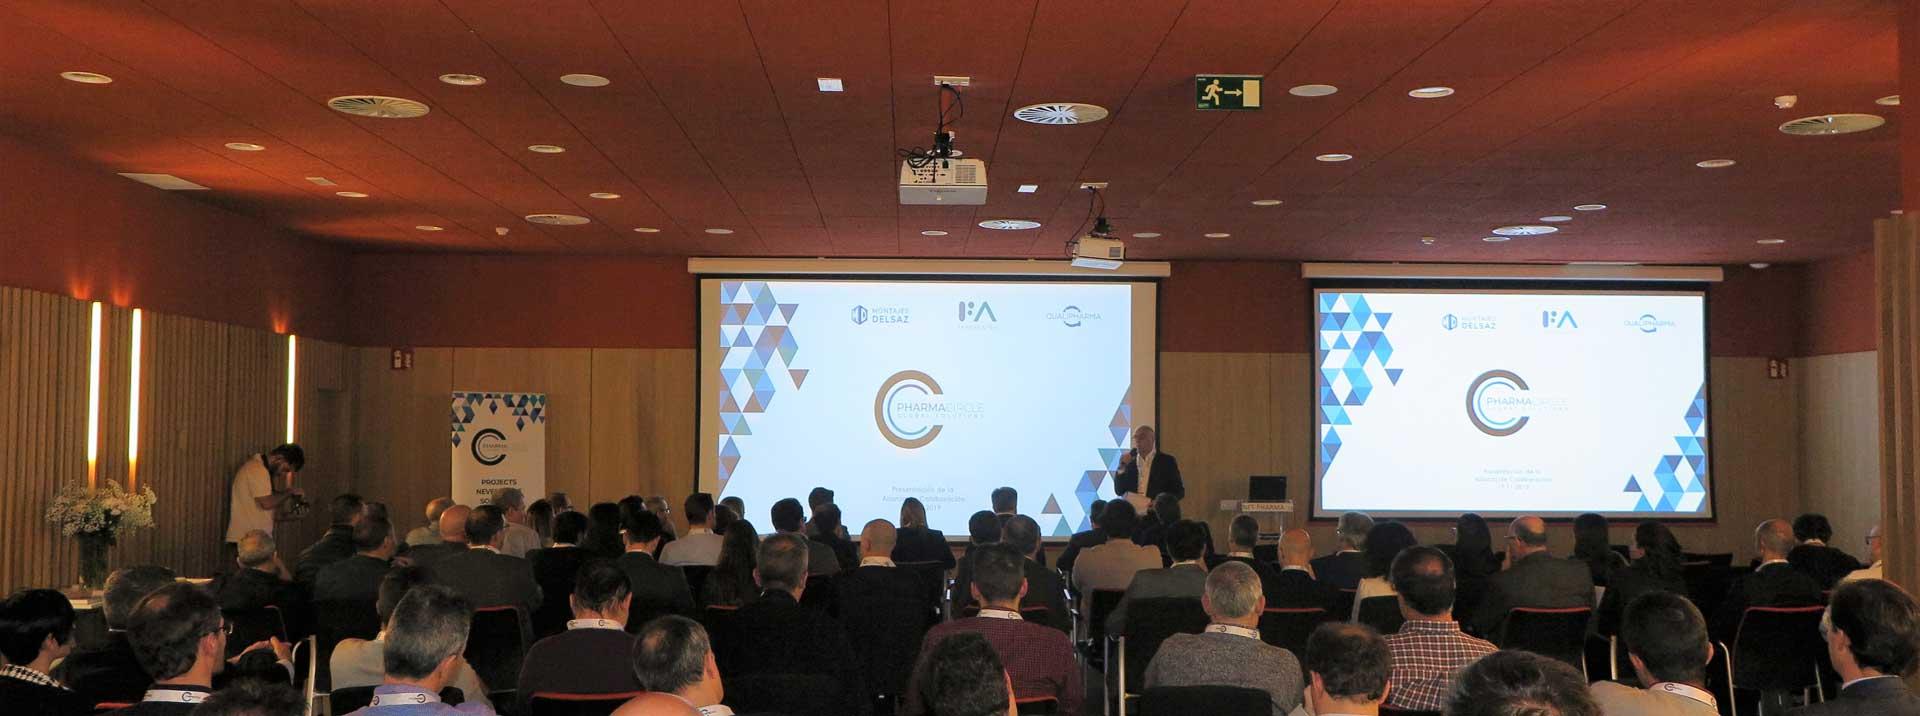 Montajes Delsaz presents its new strategic alliance: Pharma Circle Global Solutions